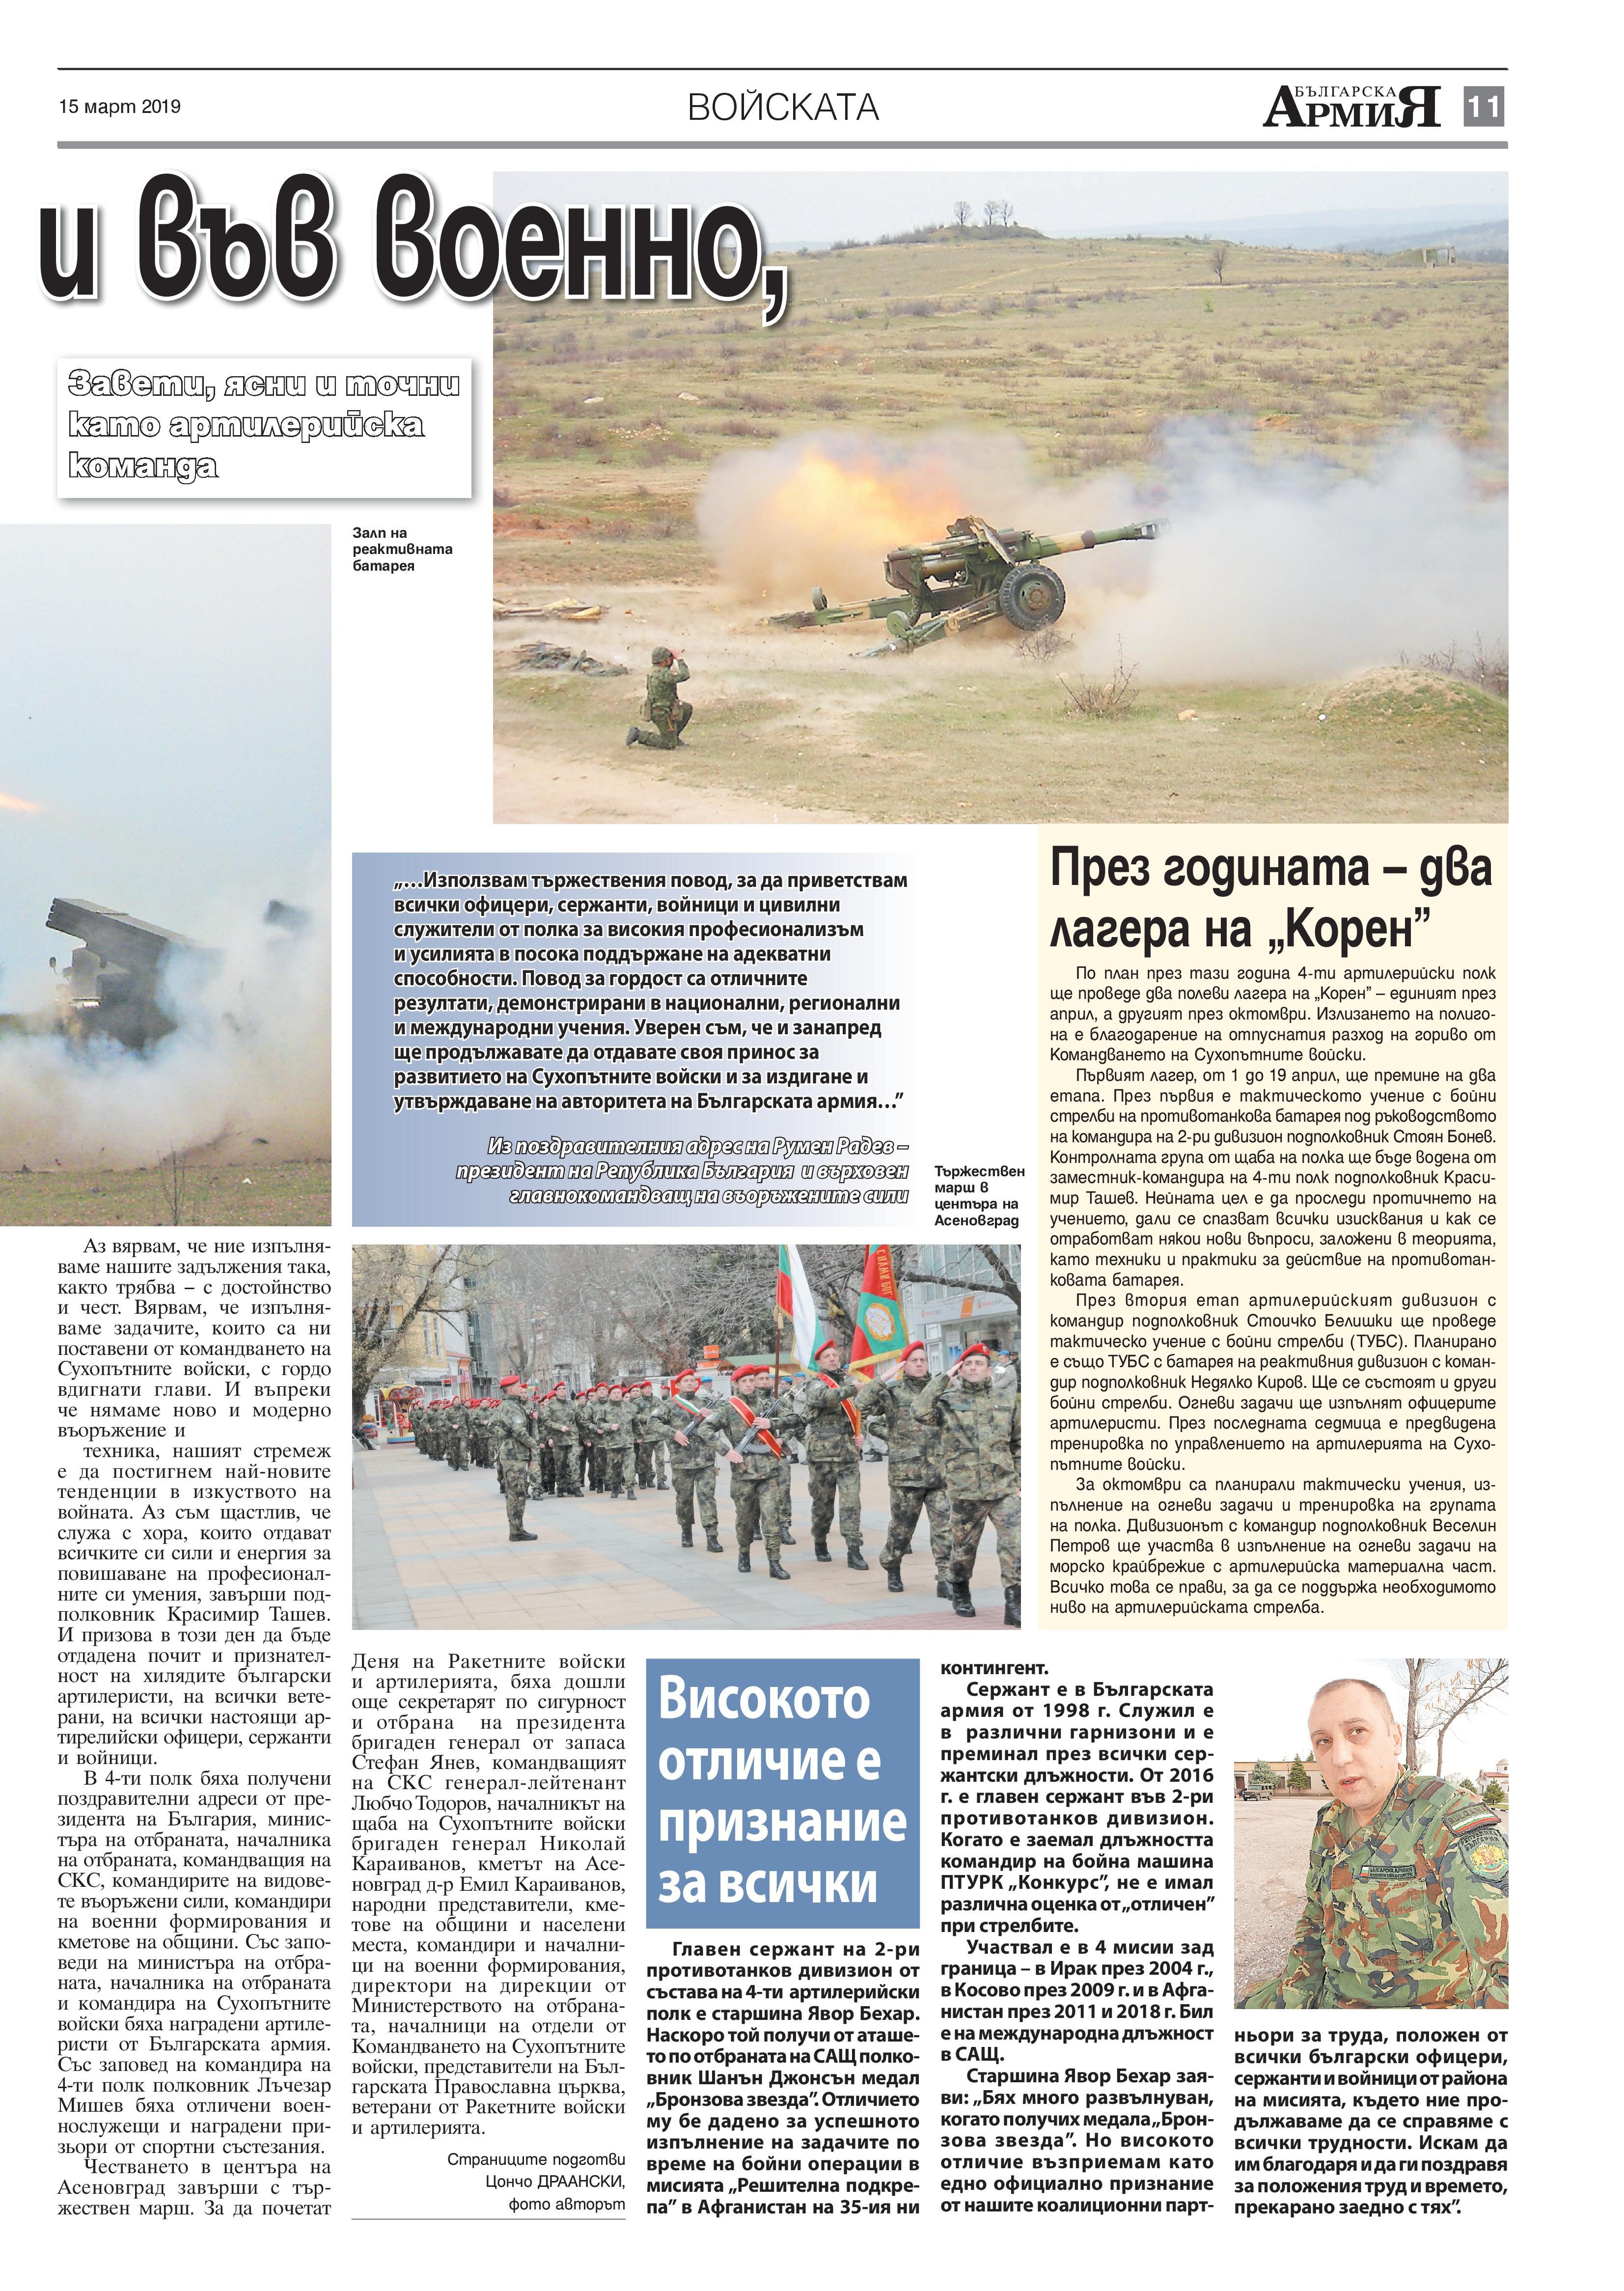 https://www.armymedia.bg/wp-content/uploads/2015/06/11-27.jpg